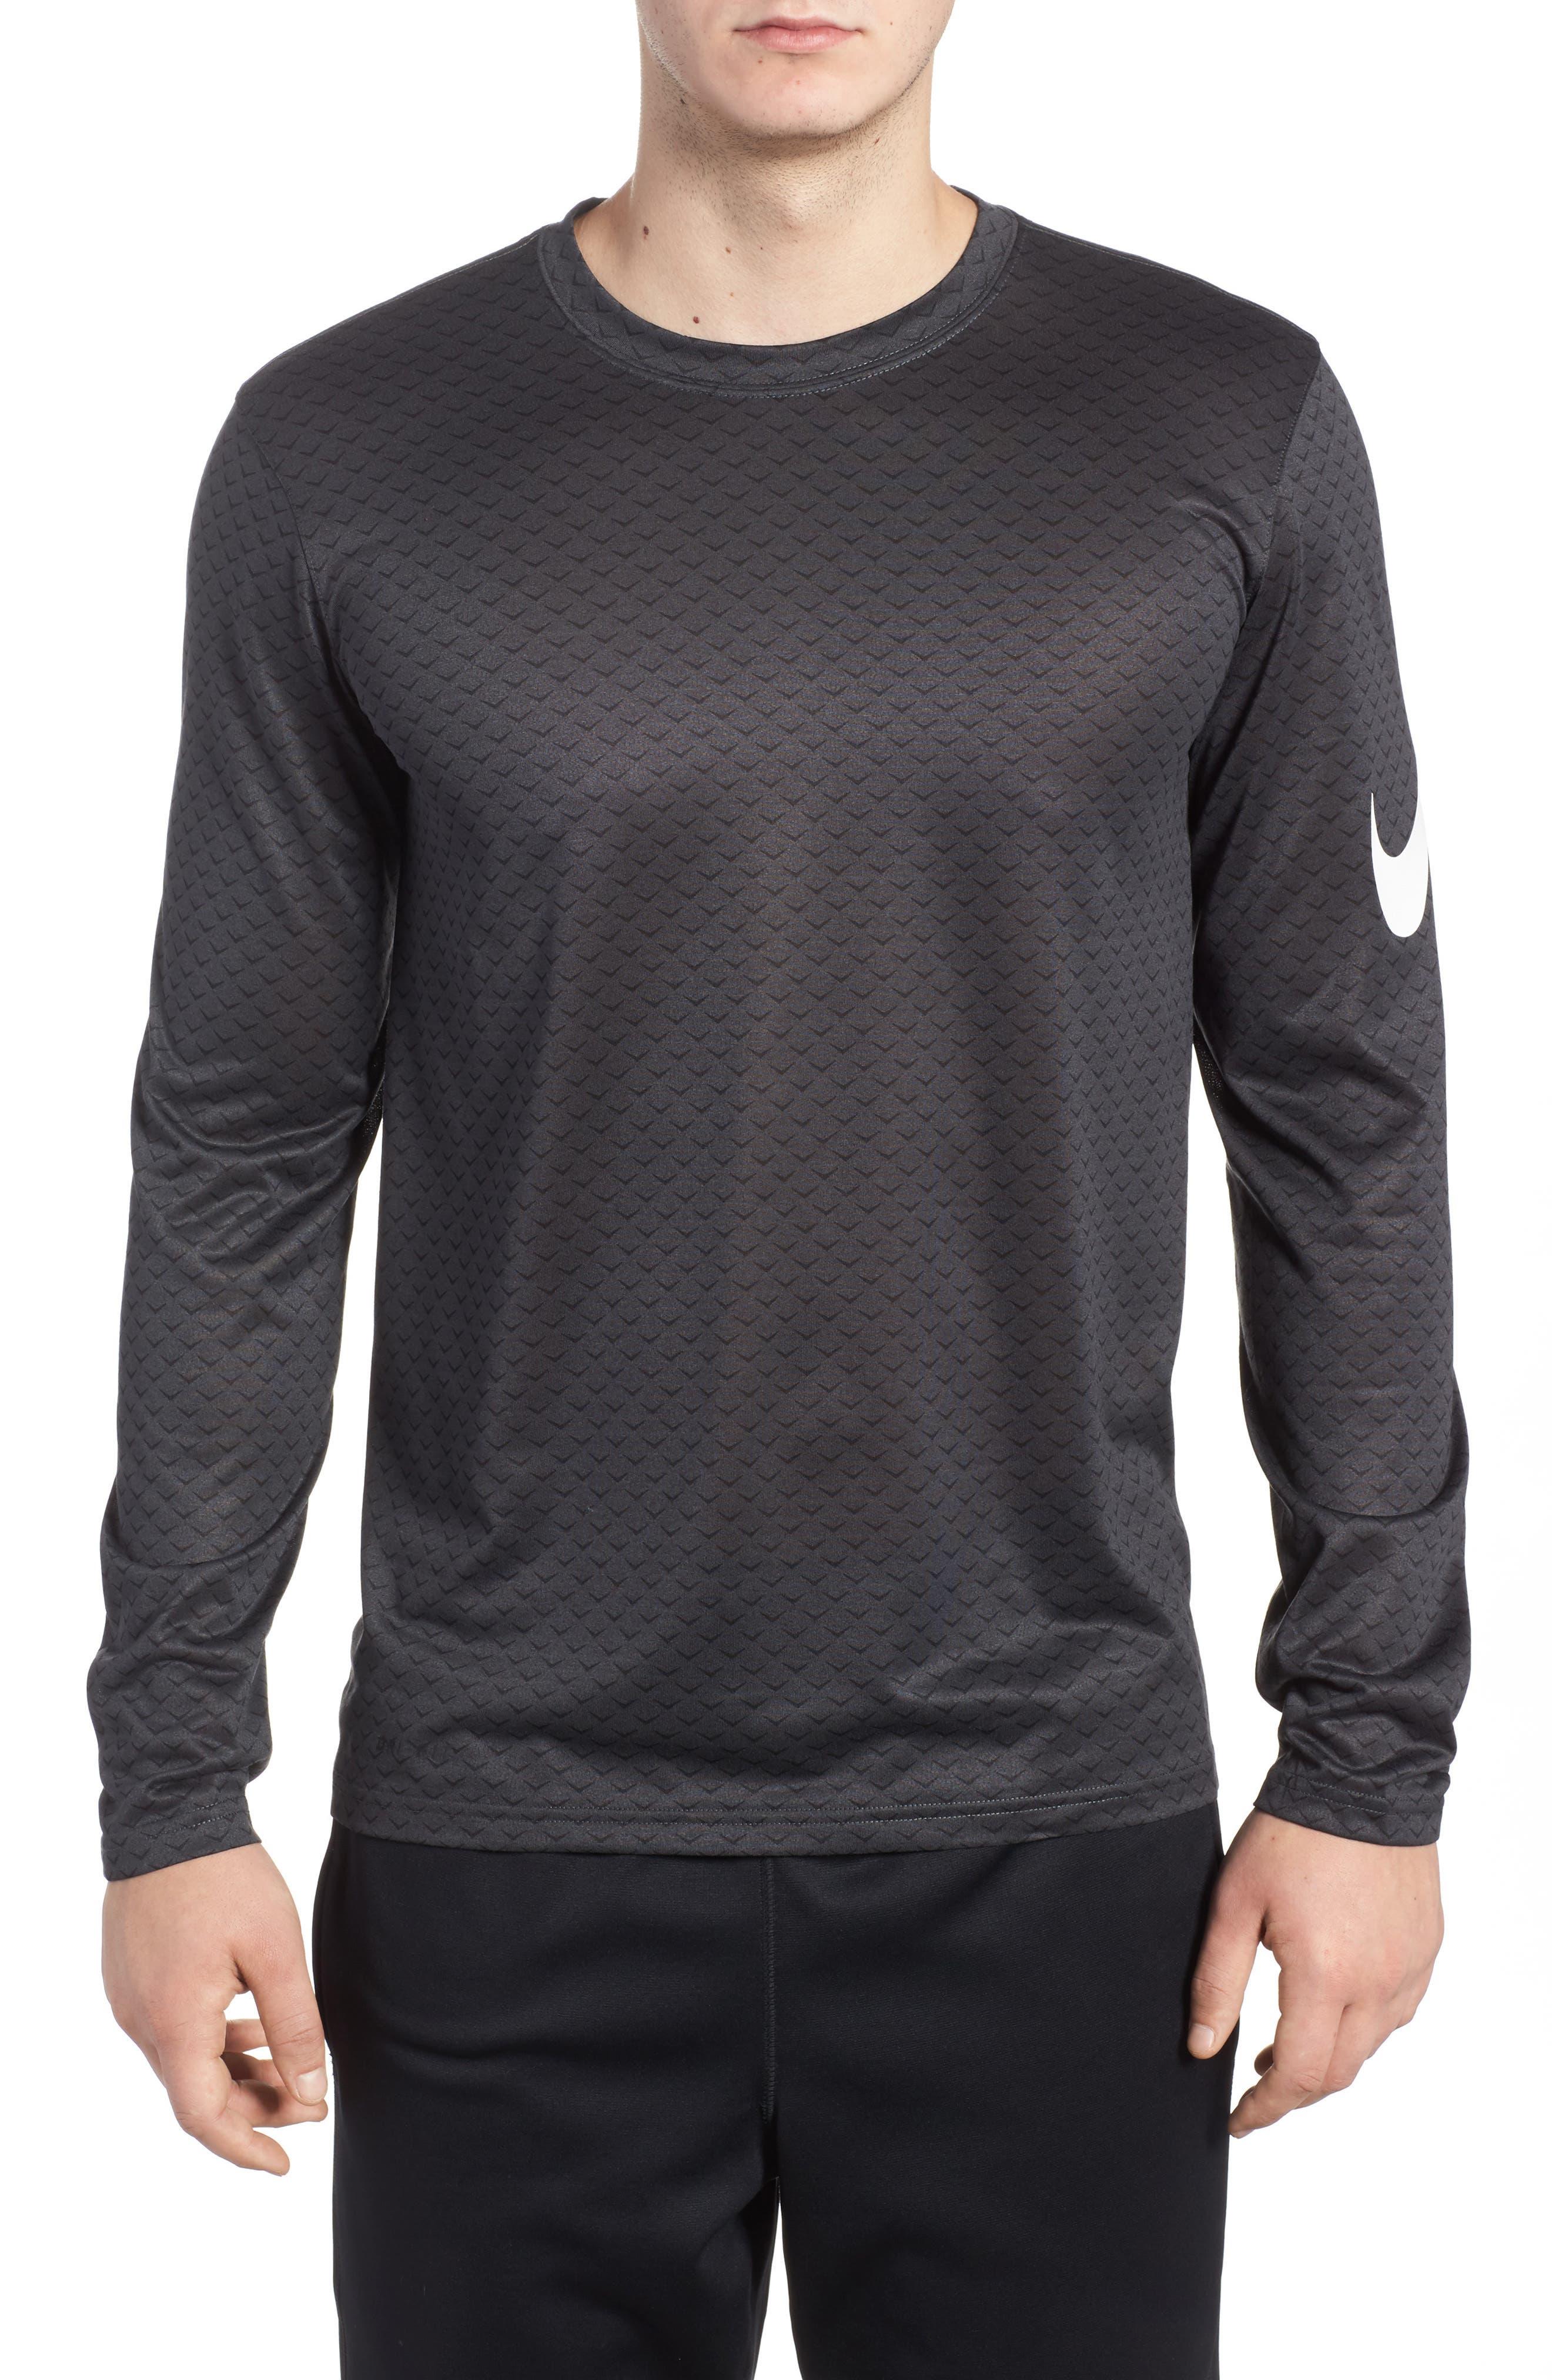 Dry Legend Training T-Shirt,                             Main thumbnail 1, color,                             Anthracite/ White